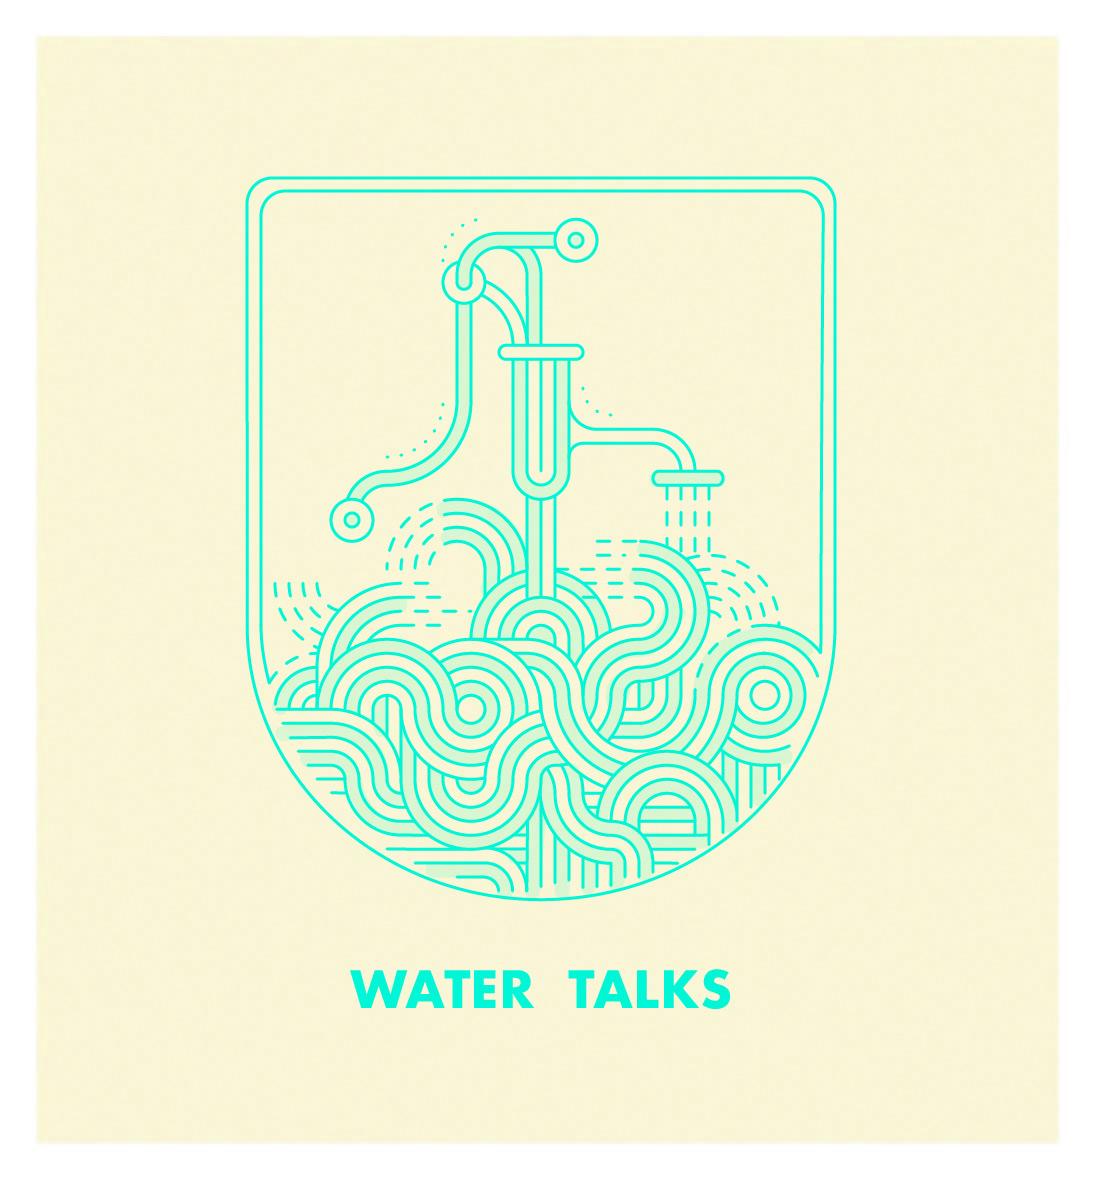 WATERTALKS LOGO.jpg